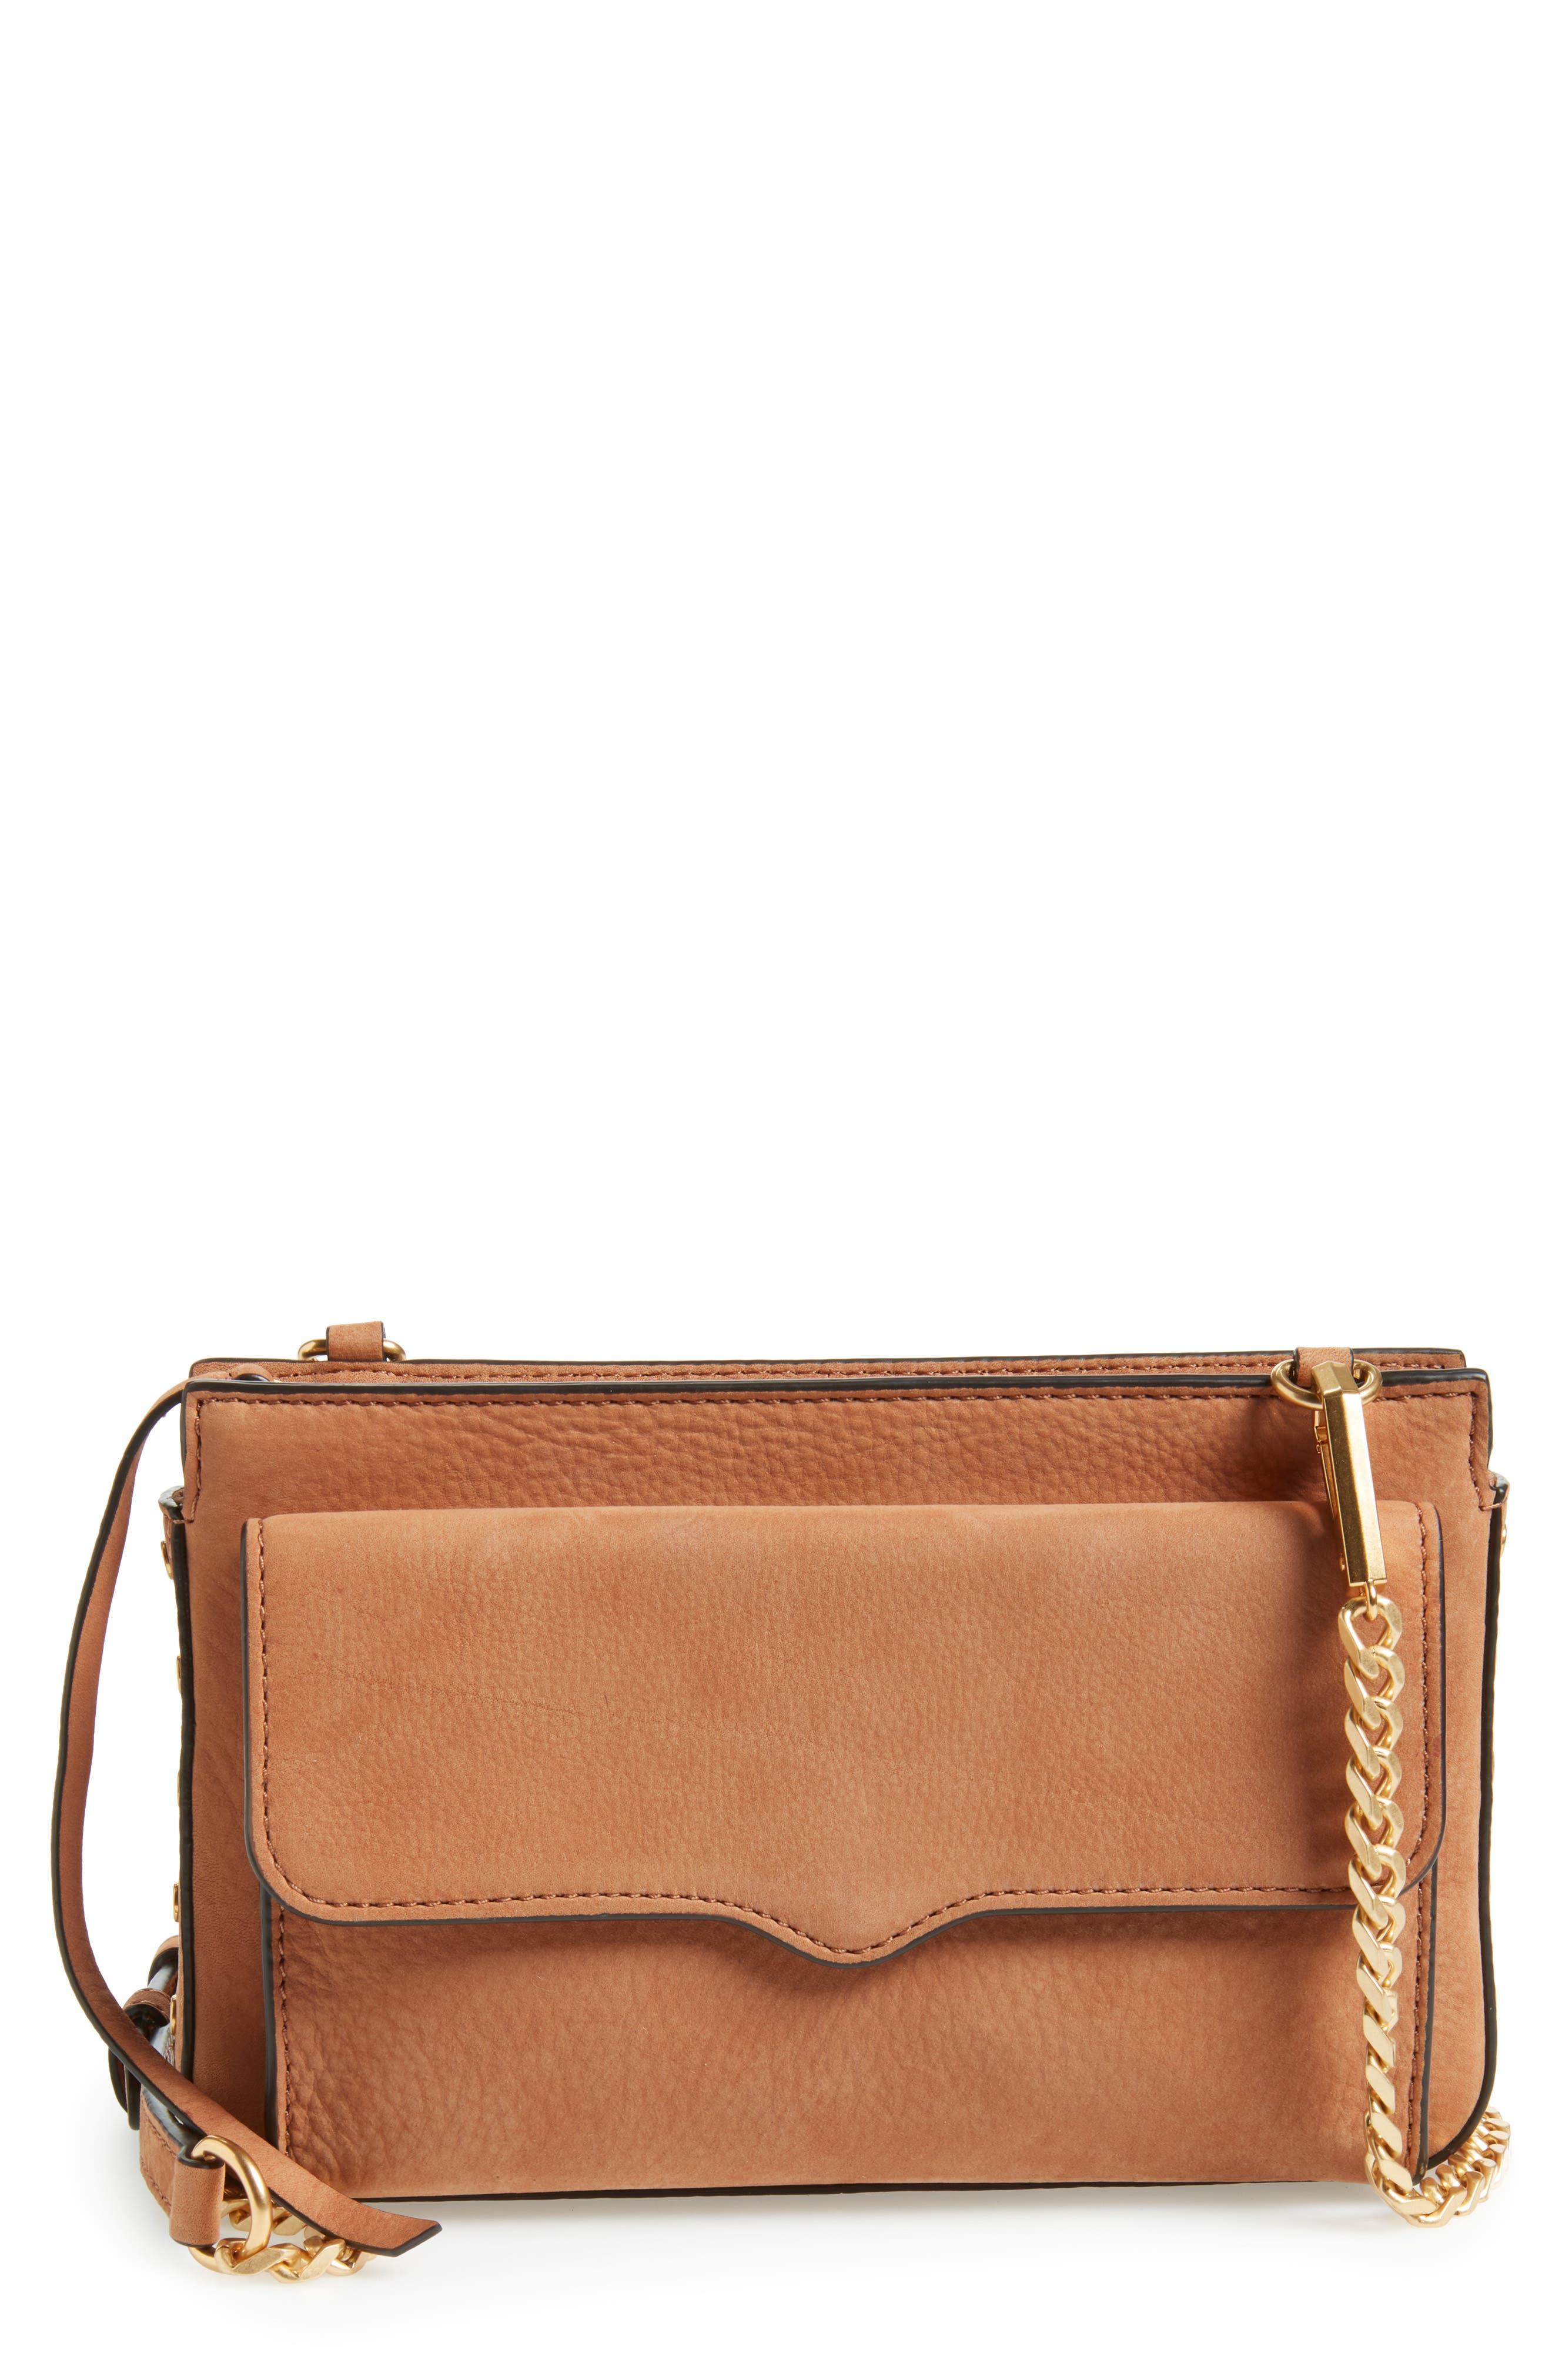 Medium Bree Nubuck Crossbody Wallet,                             Main thumbnail 1, color,                             ALMOND